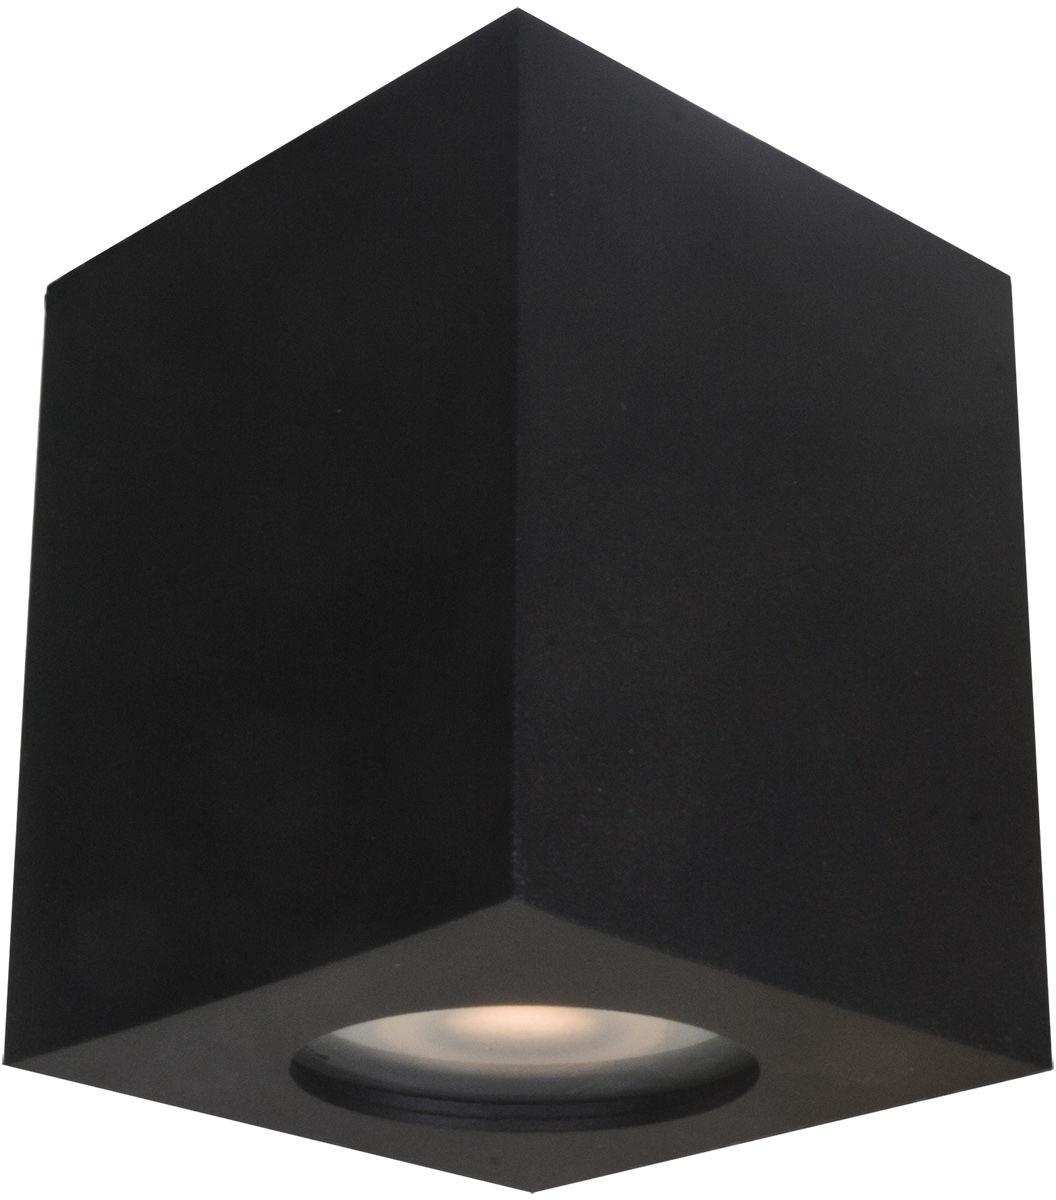 Lampa sufitowa Fabrycio IT8003S1-BK Italux czarna nowoczesna lampa na sufit